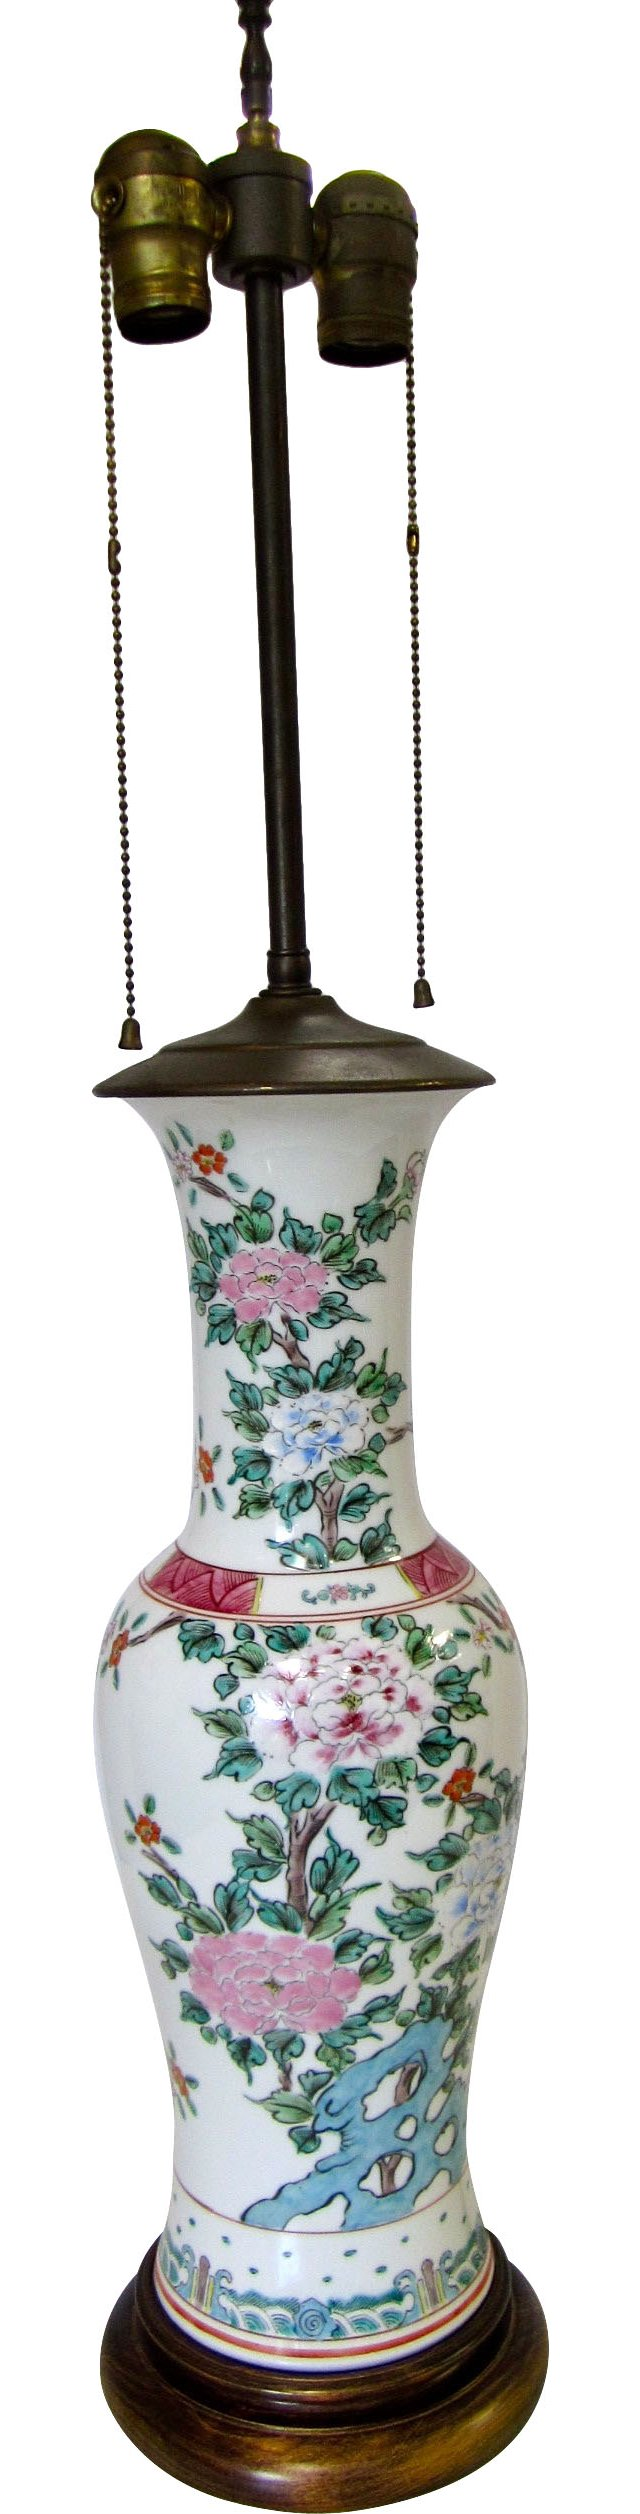 Asian Floral Lamp